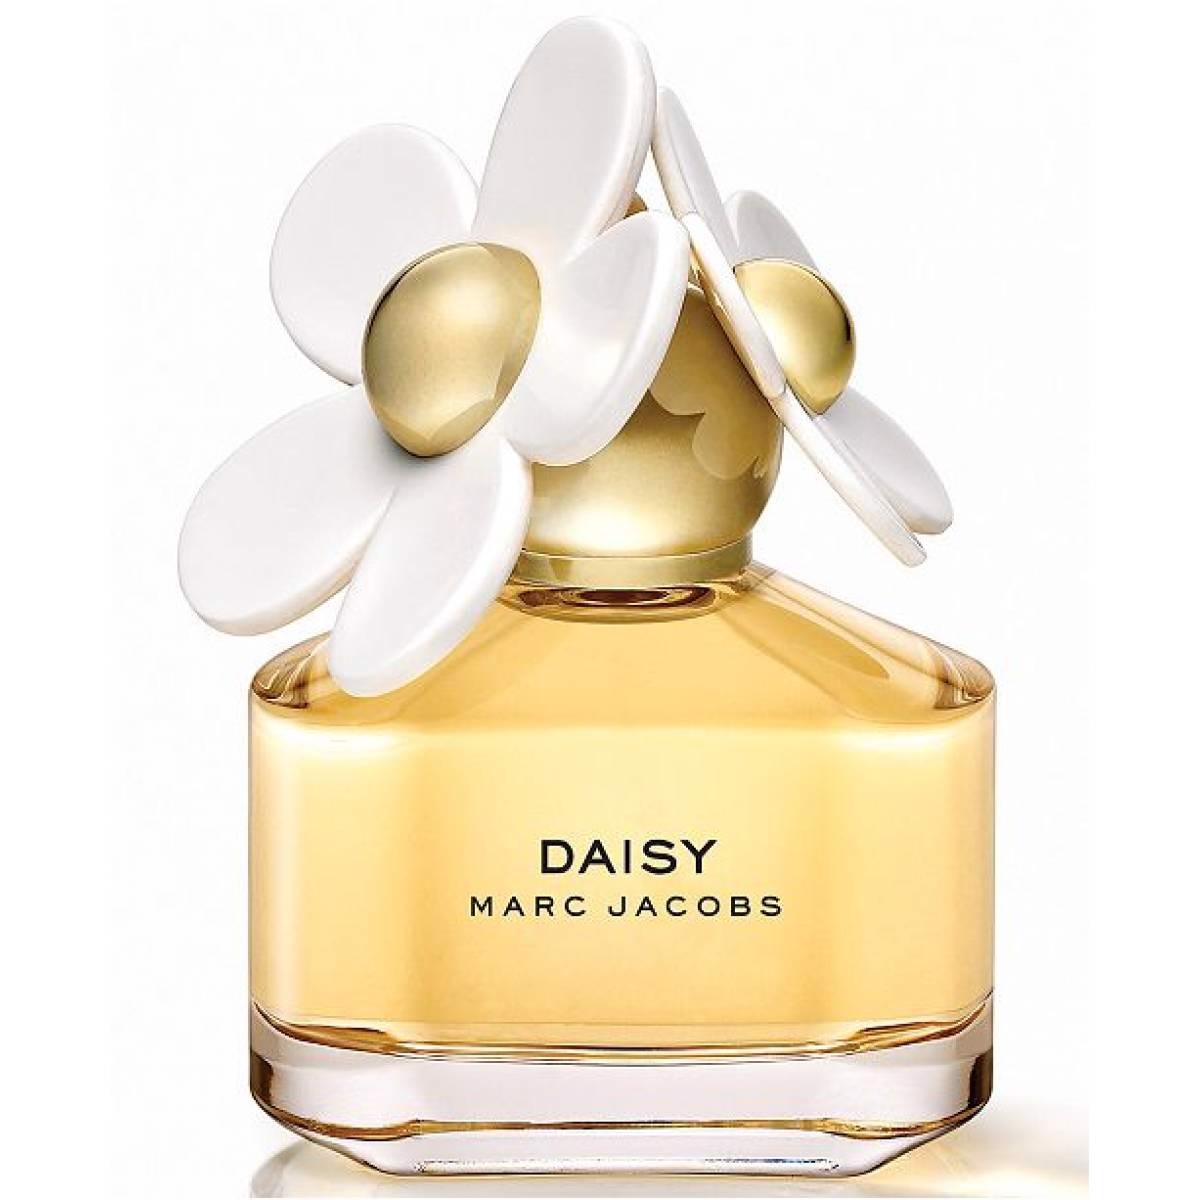 Nước Hoa Marc Jacobs Daisy By Marc Jacobs For Women. Eau De Toilette Spray